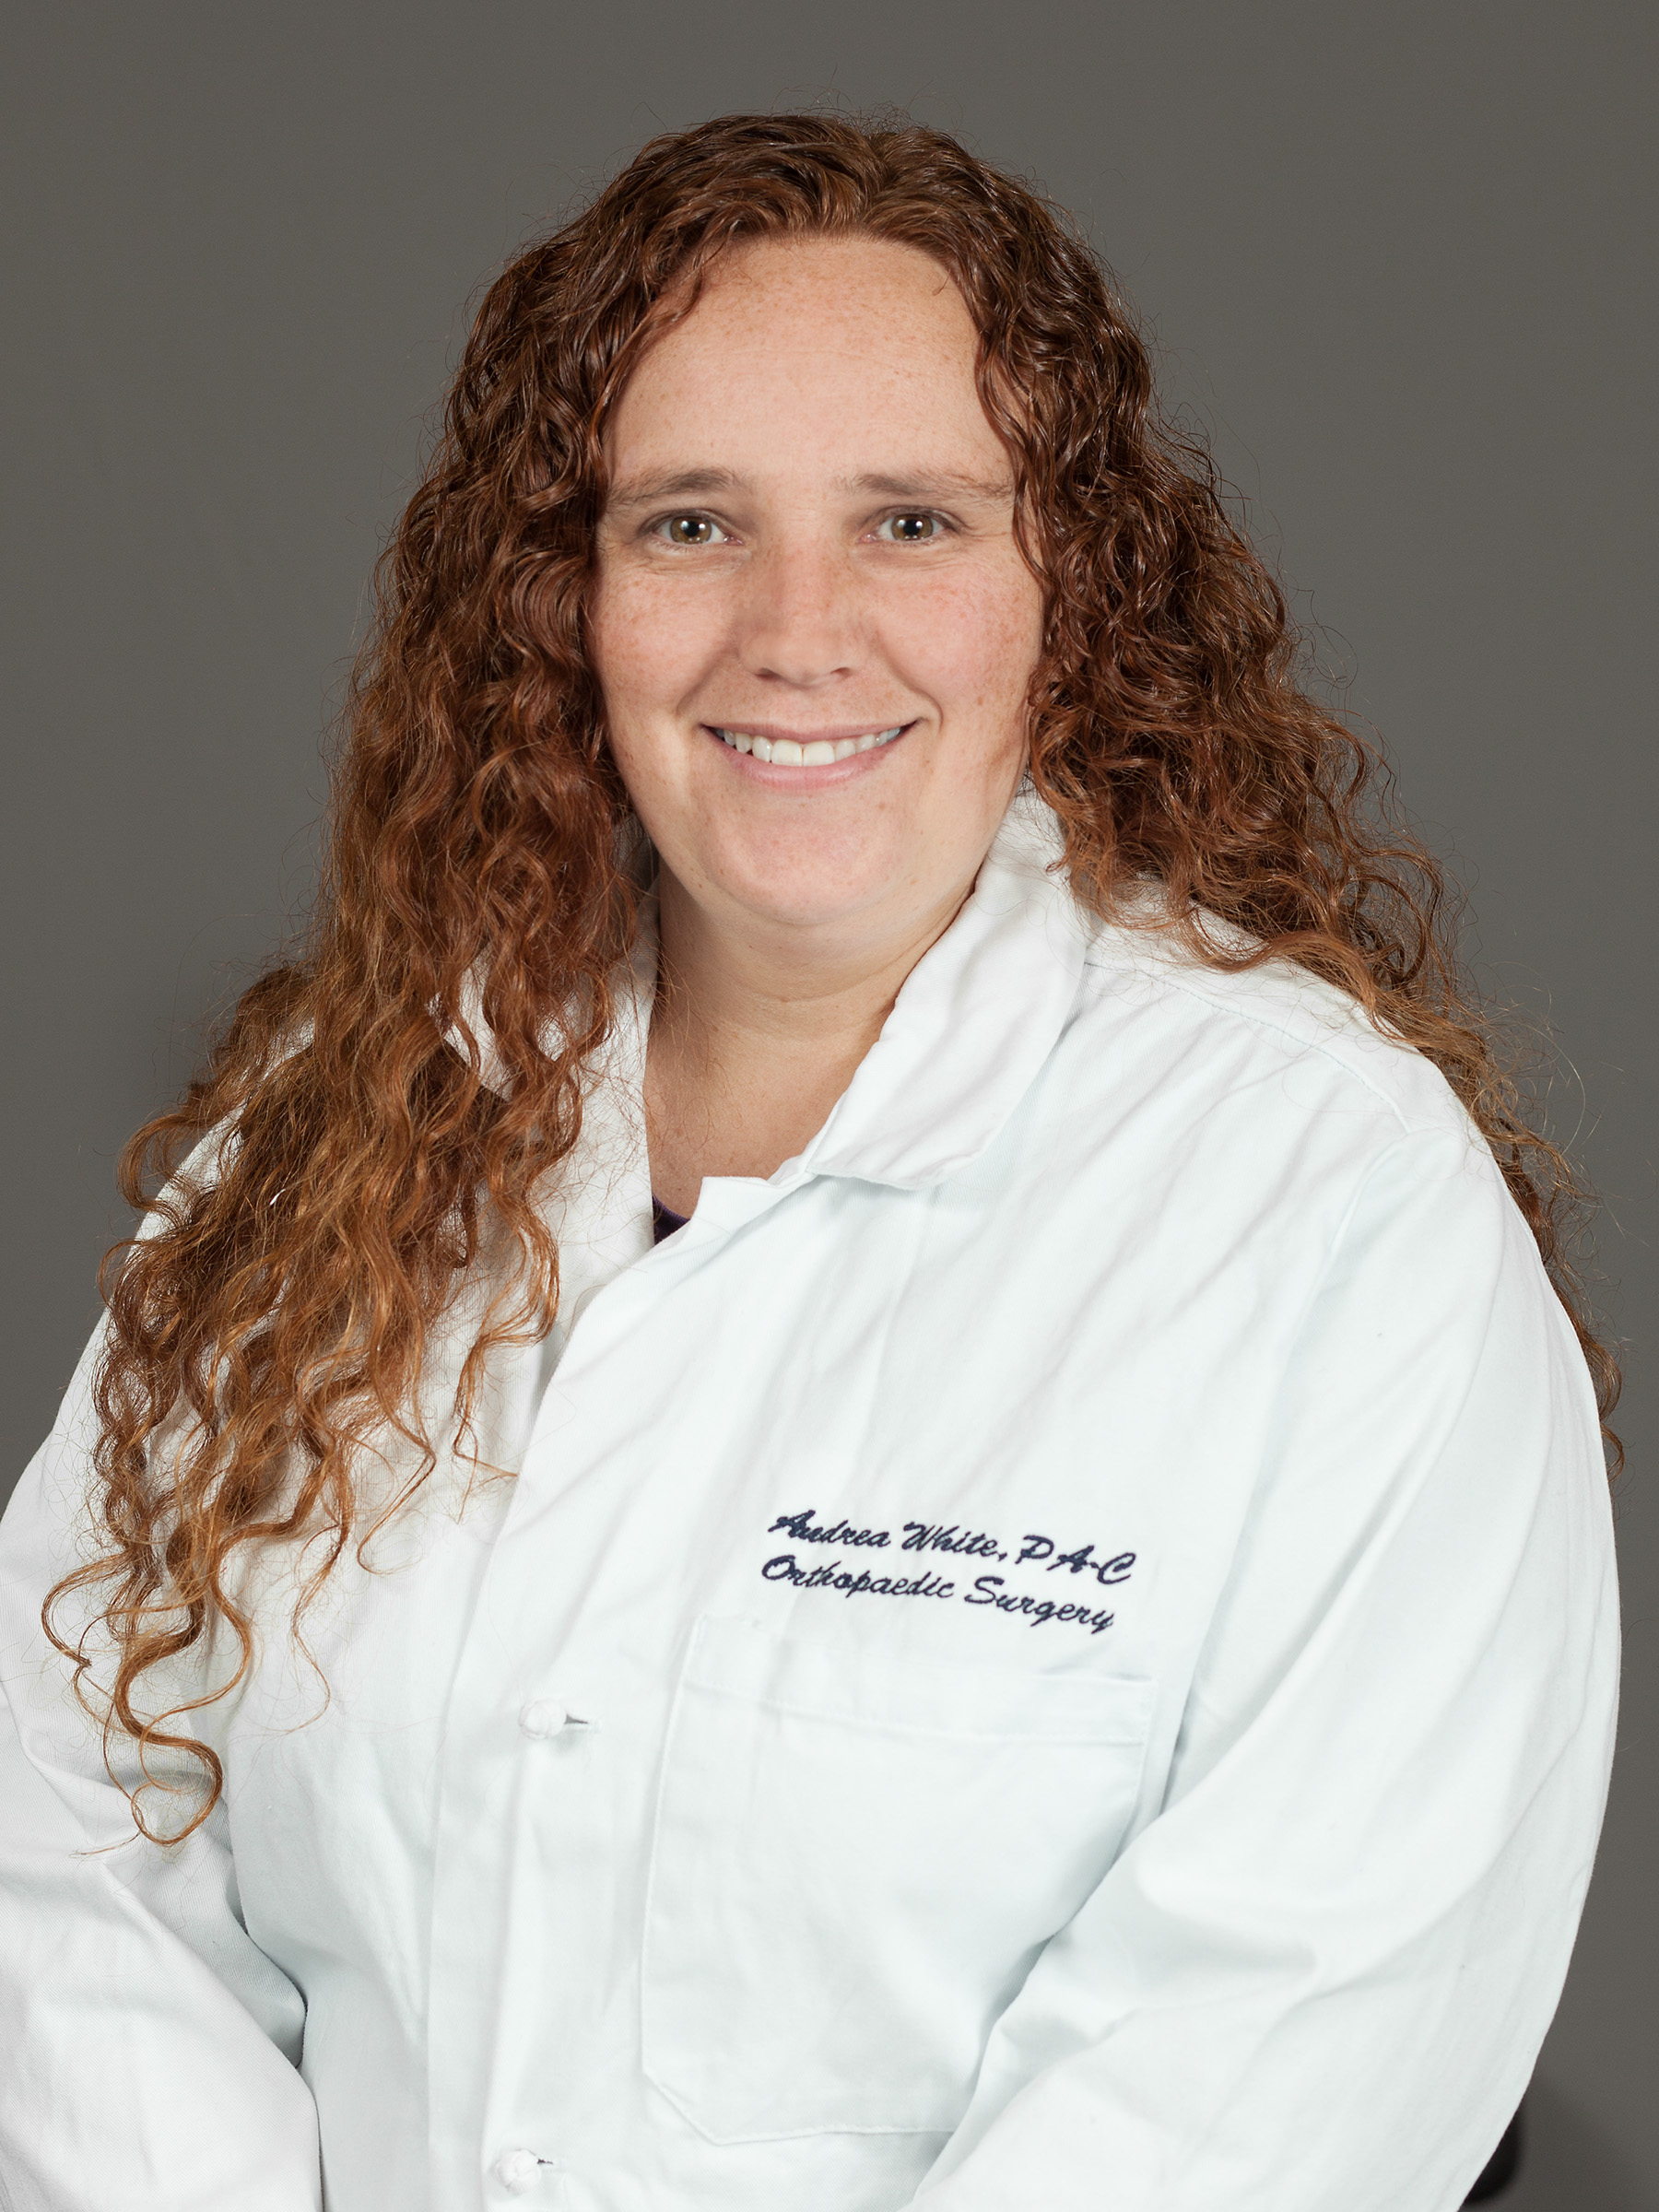 Andrea White, Physician Assistant, UVA Orthopaedics